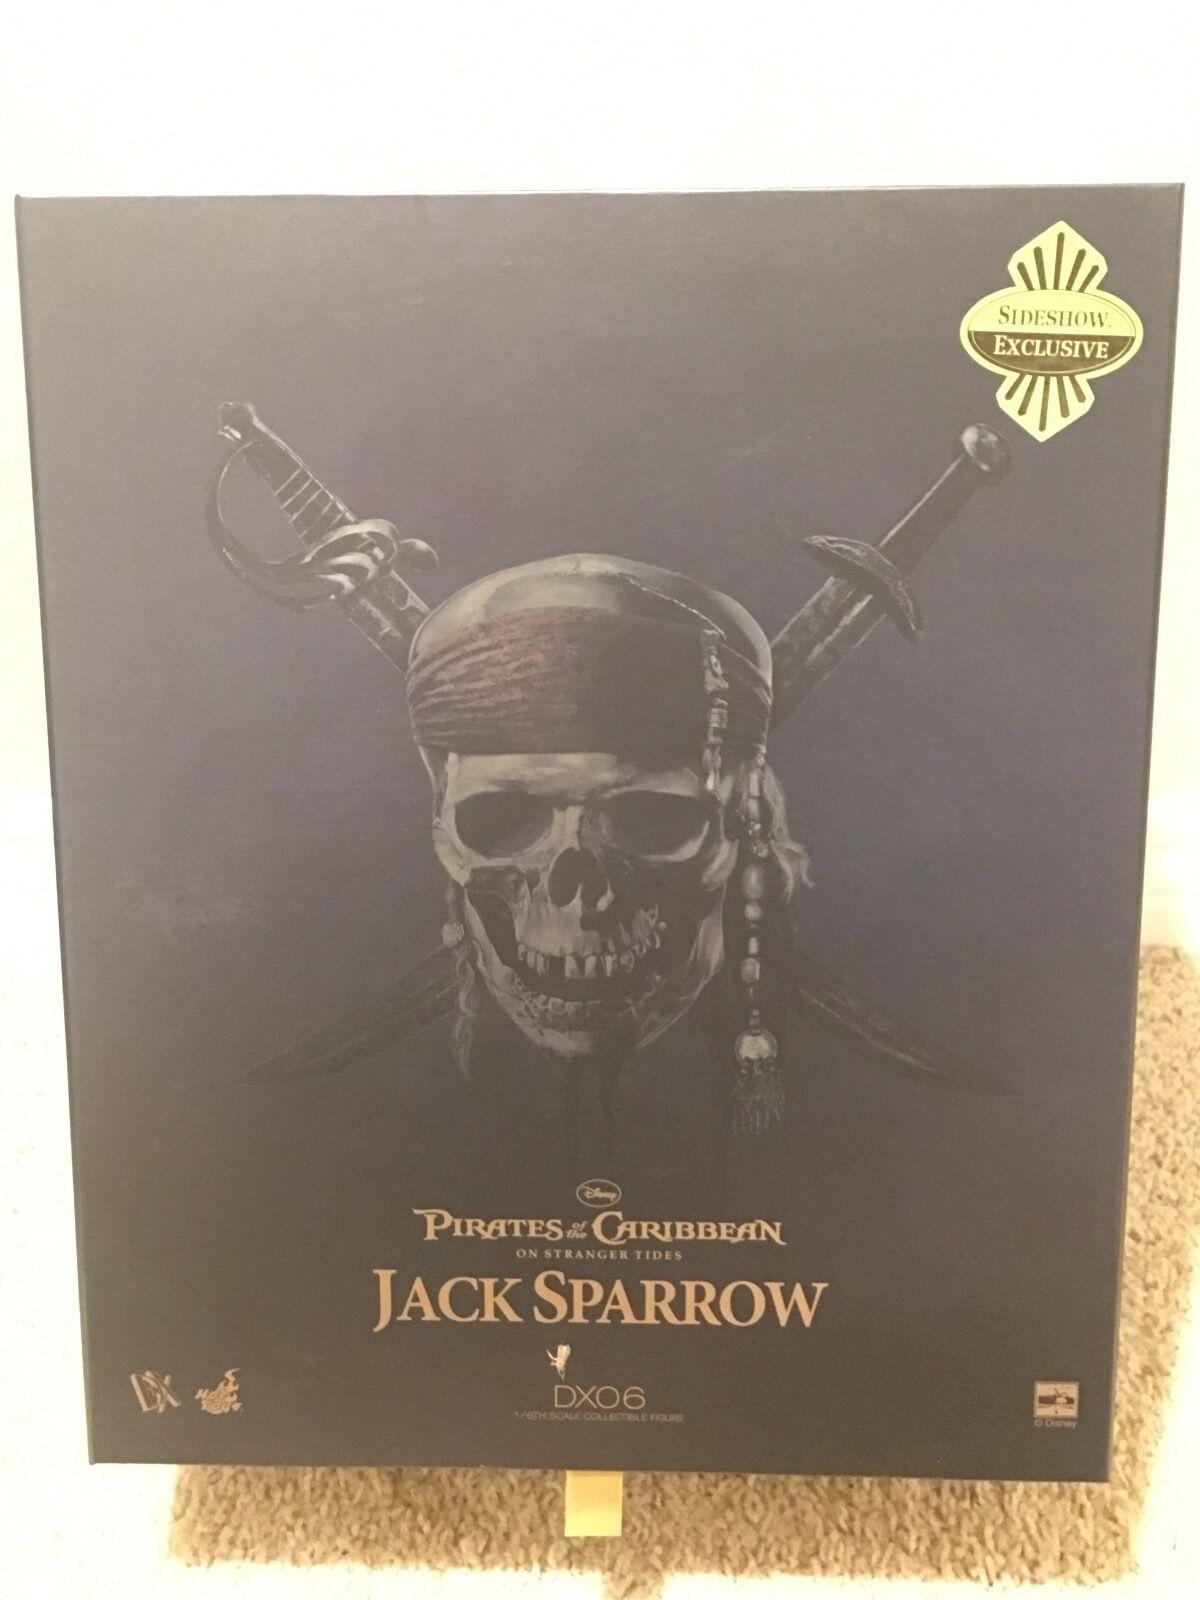 Juguete caliente Jack Sparrow dx06 gráfica 1   6, exposición lateral exclusiva con prismáticos